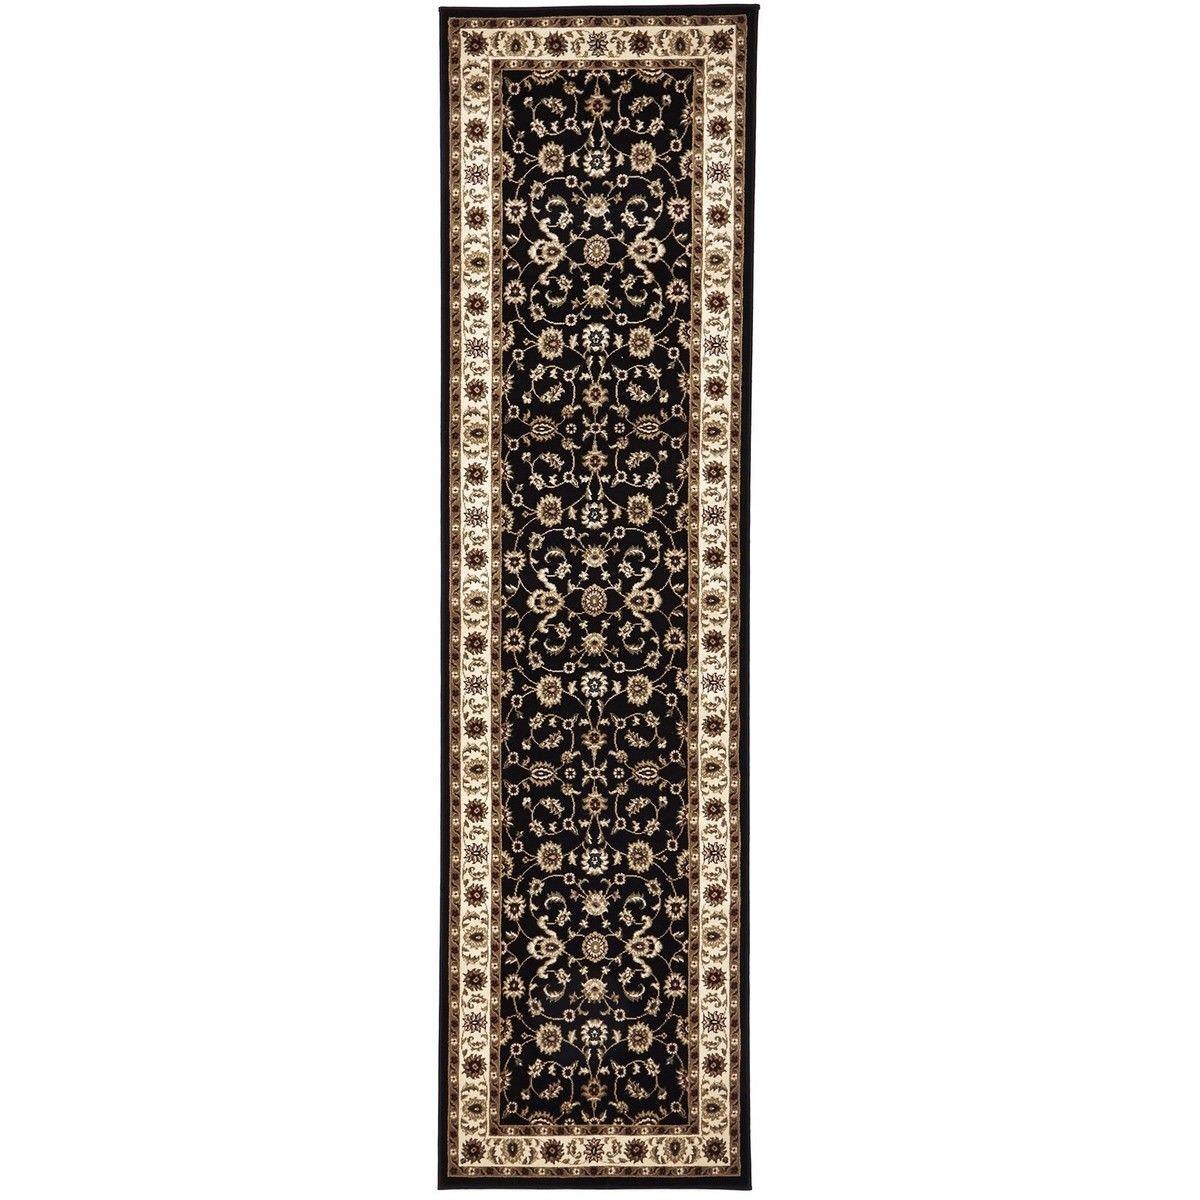 Sydney Classic Turkish Made Oriental Runner Rug, 300x80cm, Black / Ivory